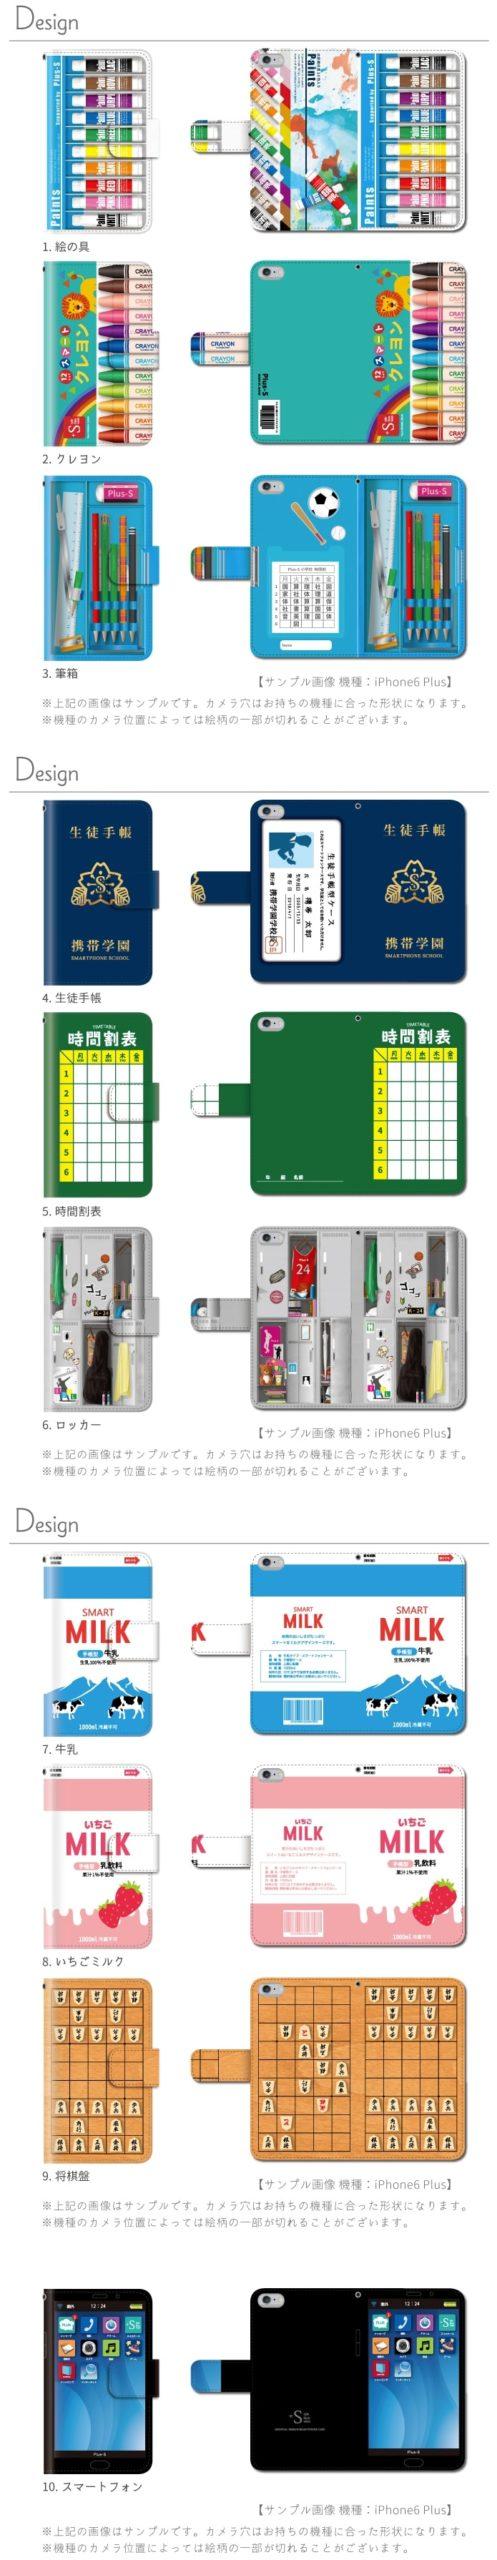 iPhone007